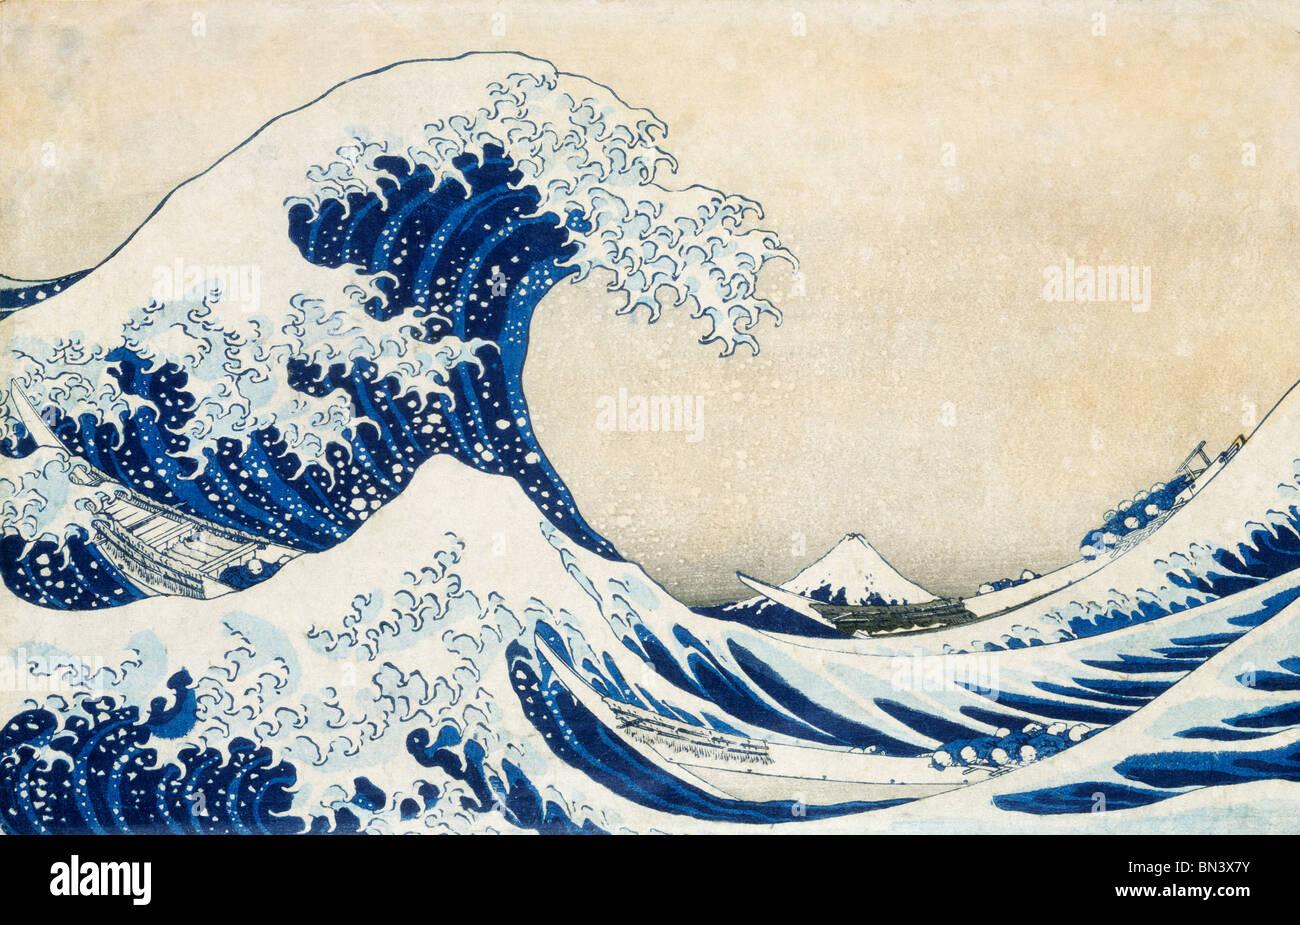 La Gran Ola, de Katsushika Hokusai. El Japón, del siglo XIX. Foto de stock